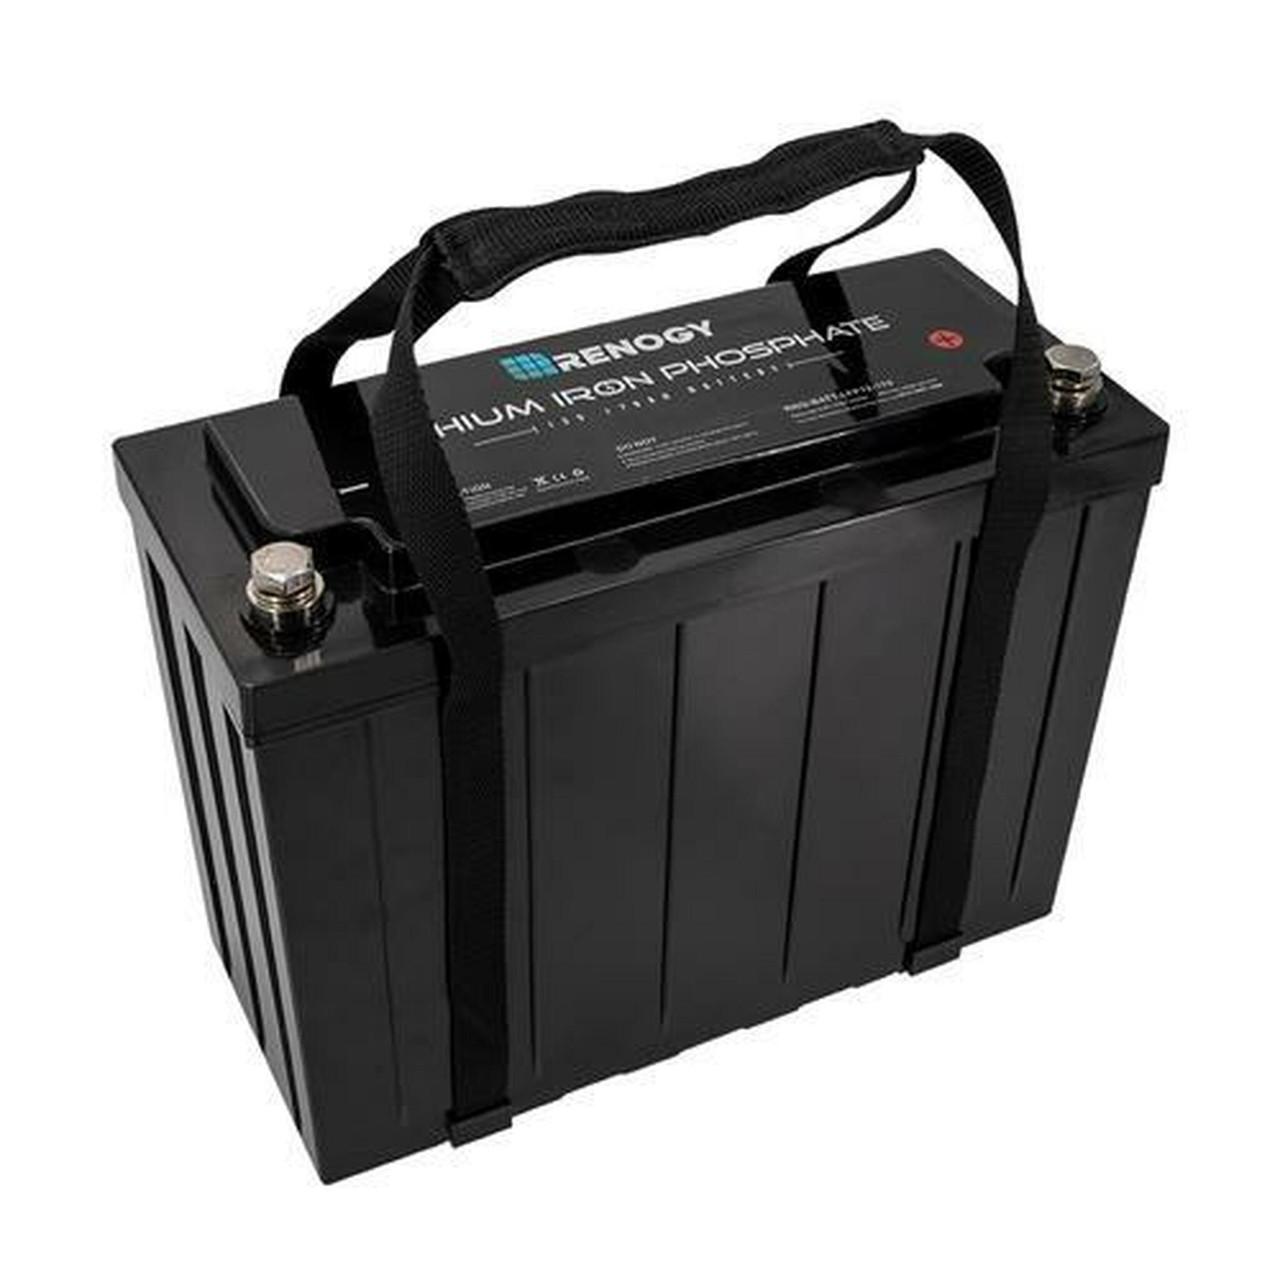 Renogy 12V 170Ah Lithium Iron Phosphate Battery